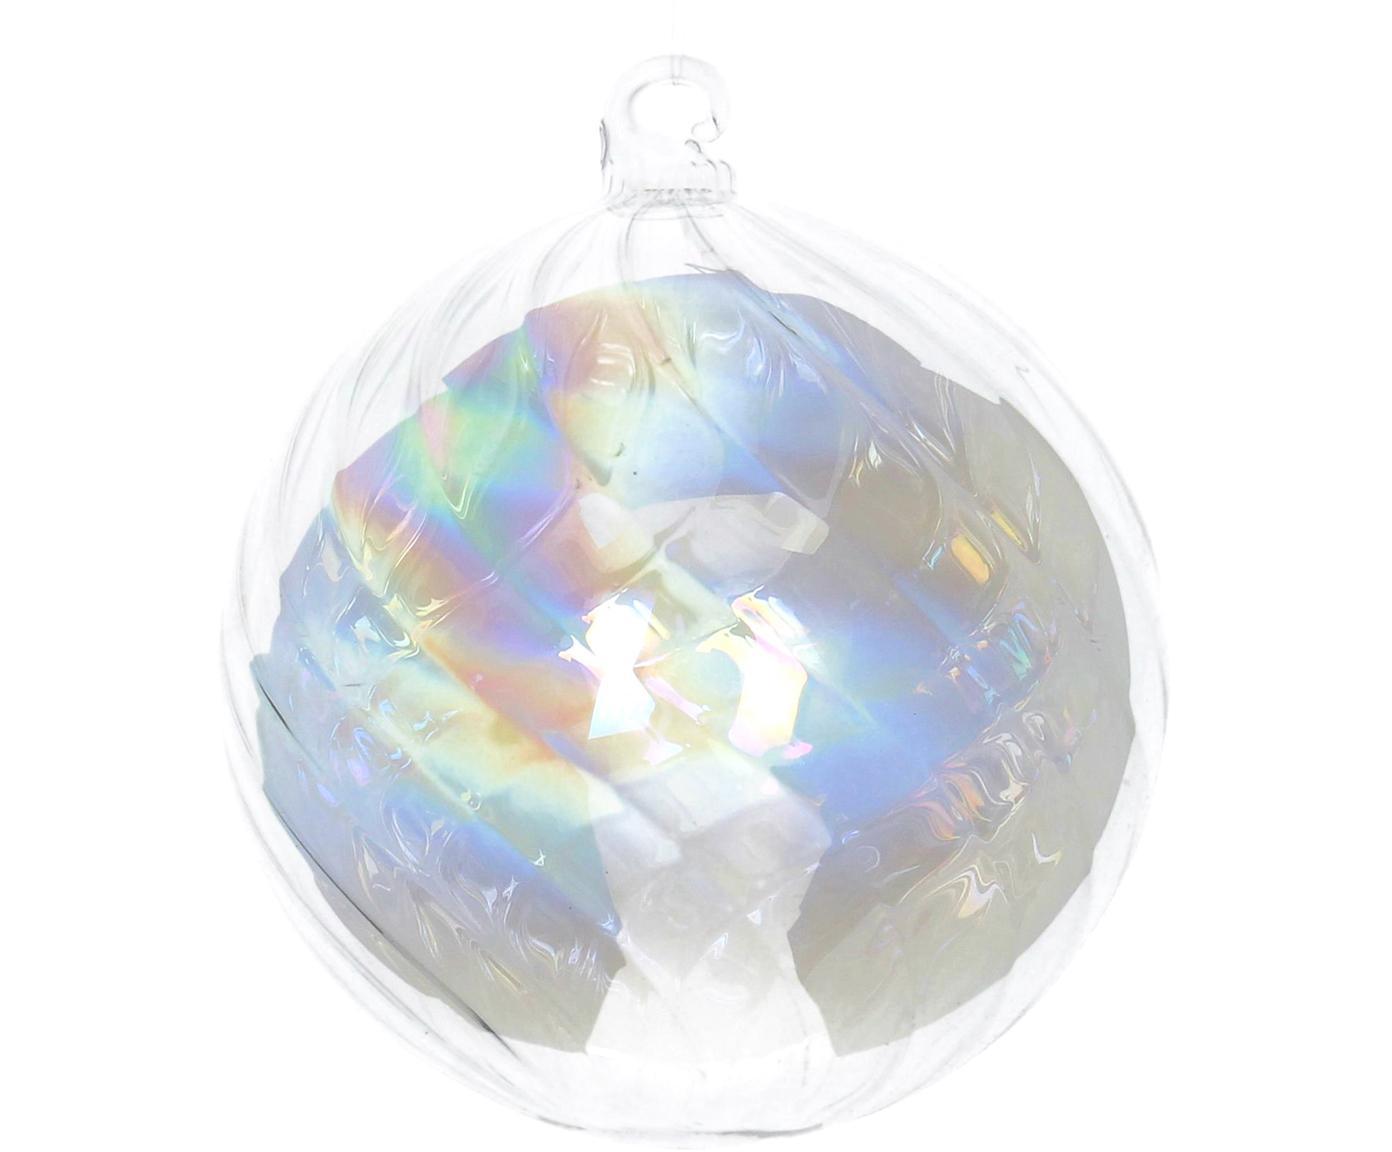 Pallina di Natale Iridescent 2 pz, Trasparente, iridescente, Ø 8 cm